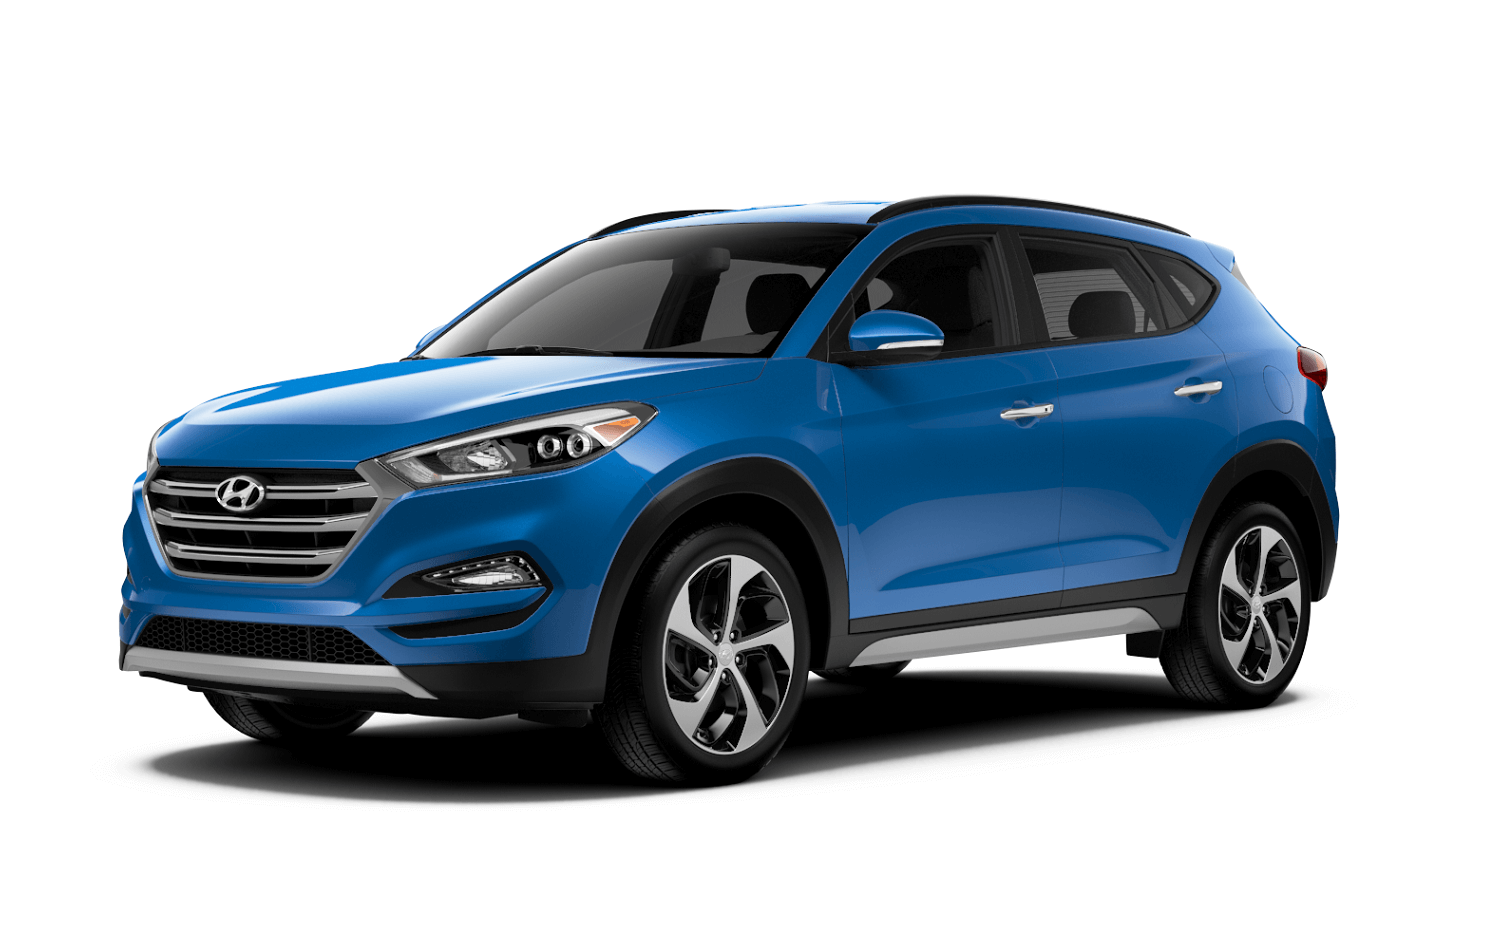 2019 Hyundai Tuscon Limited Caribbean Blue